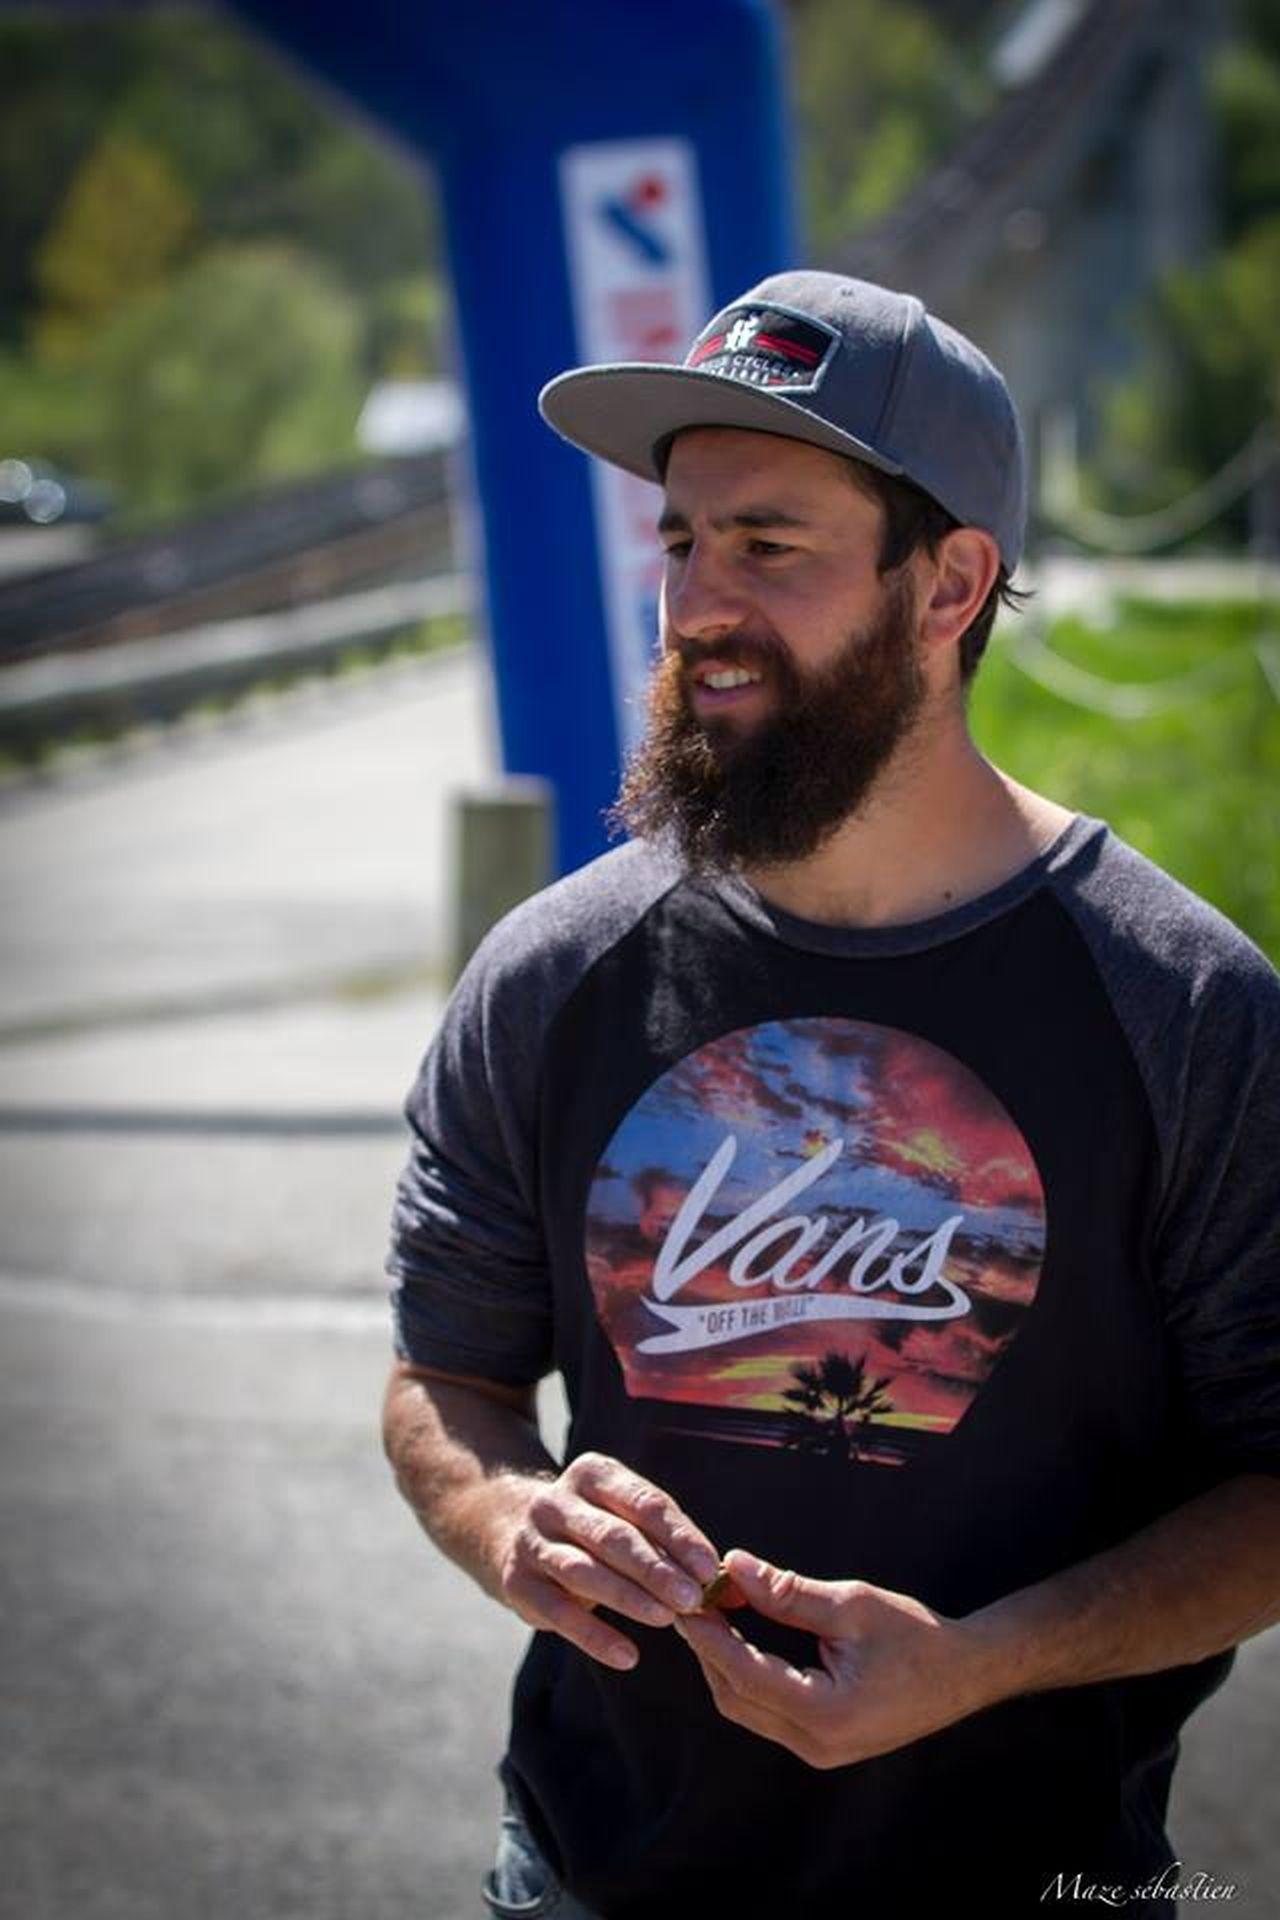 #Drifteur : Alexandre Claudin et sa Charger 68 ! 19